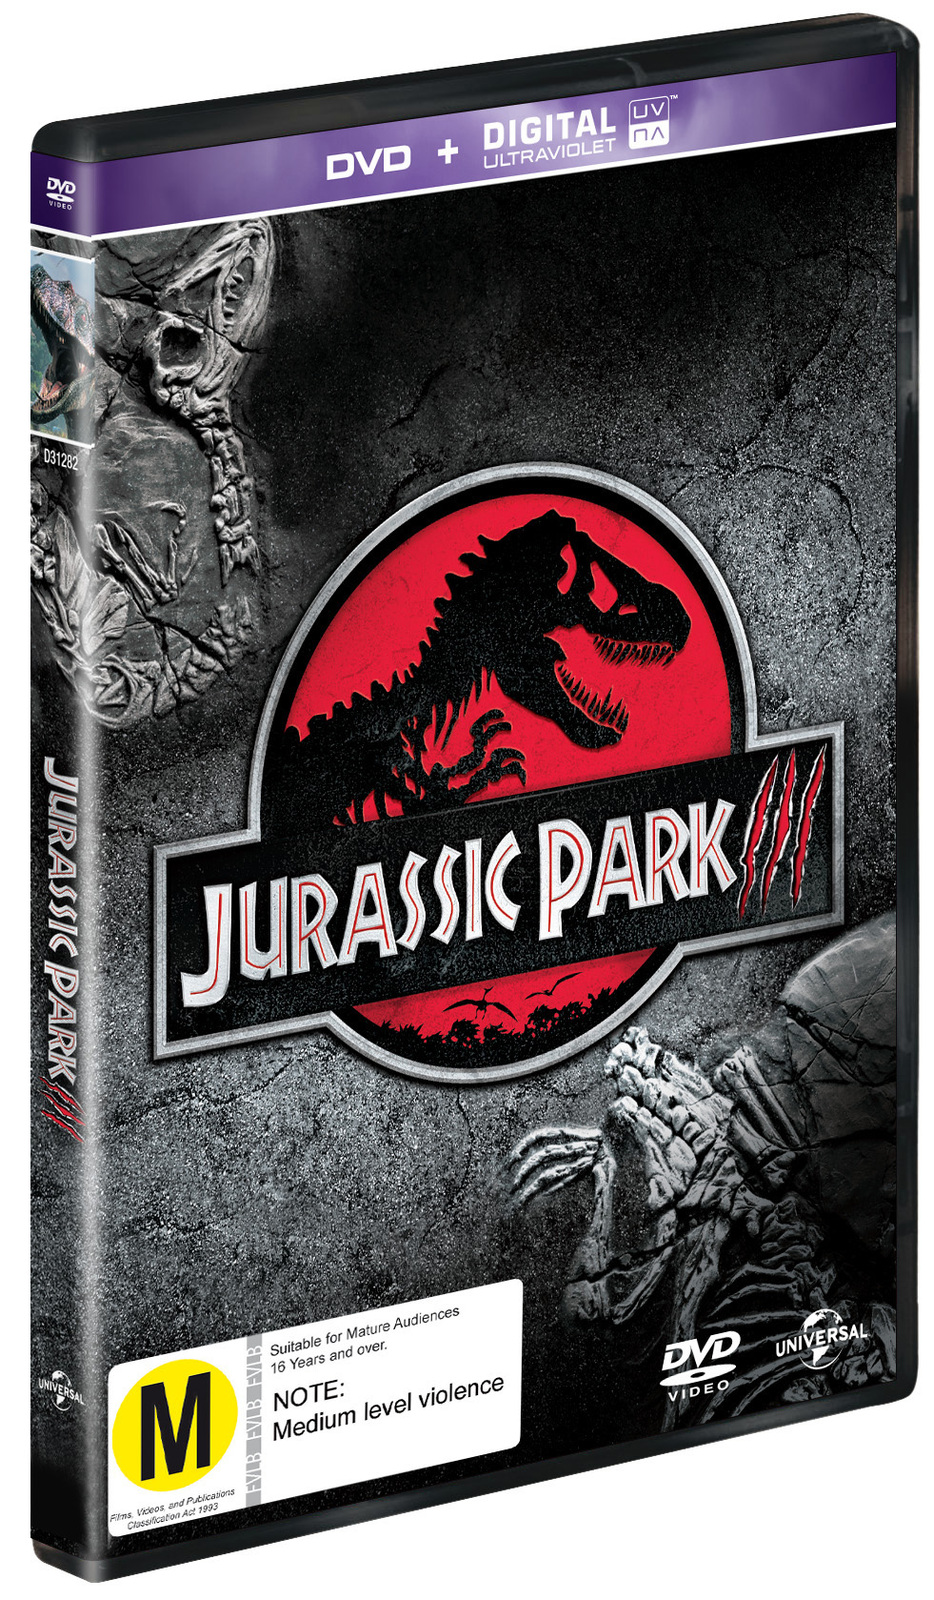 Jurassic Park 3 on DVD image